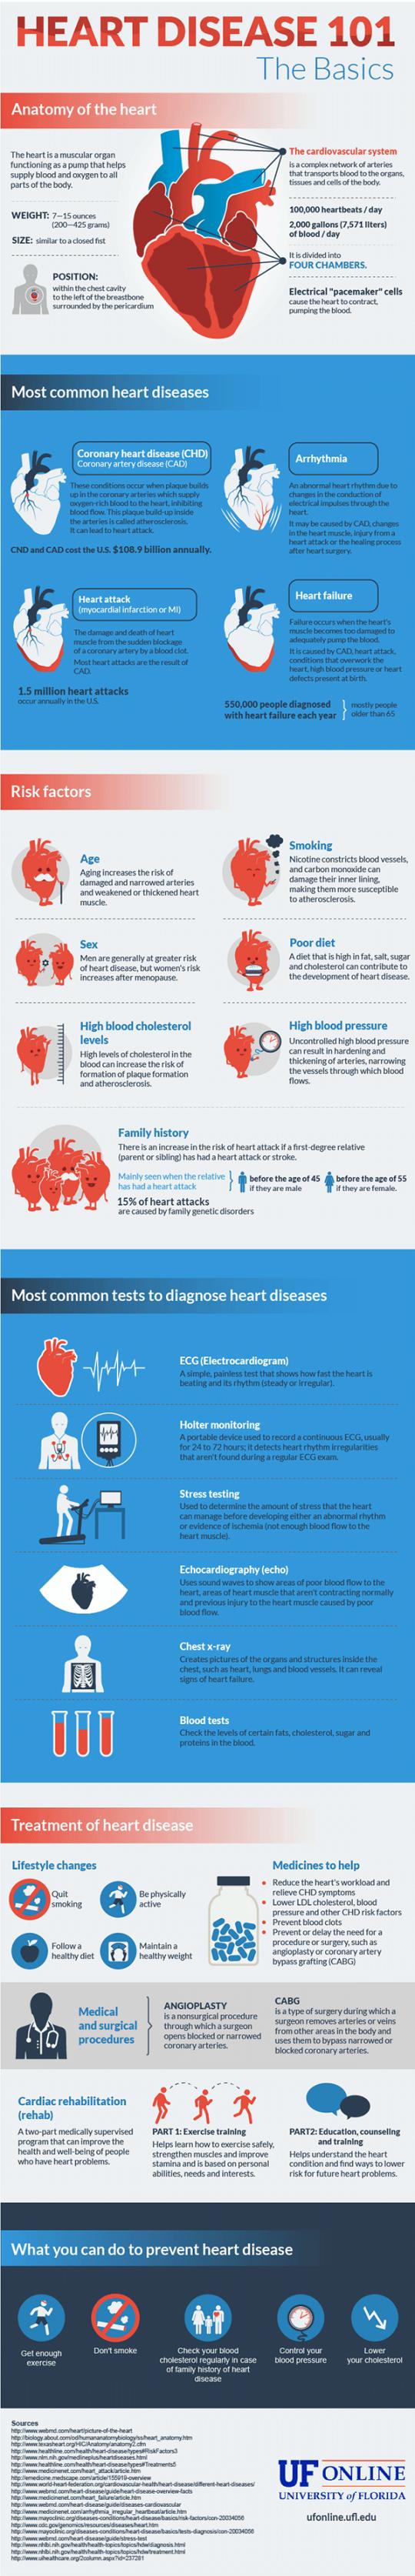 Heart Disease 101: The Basics